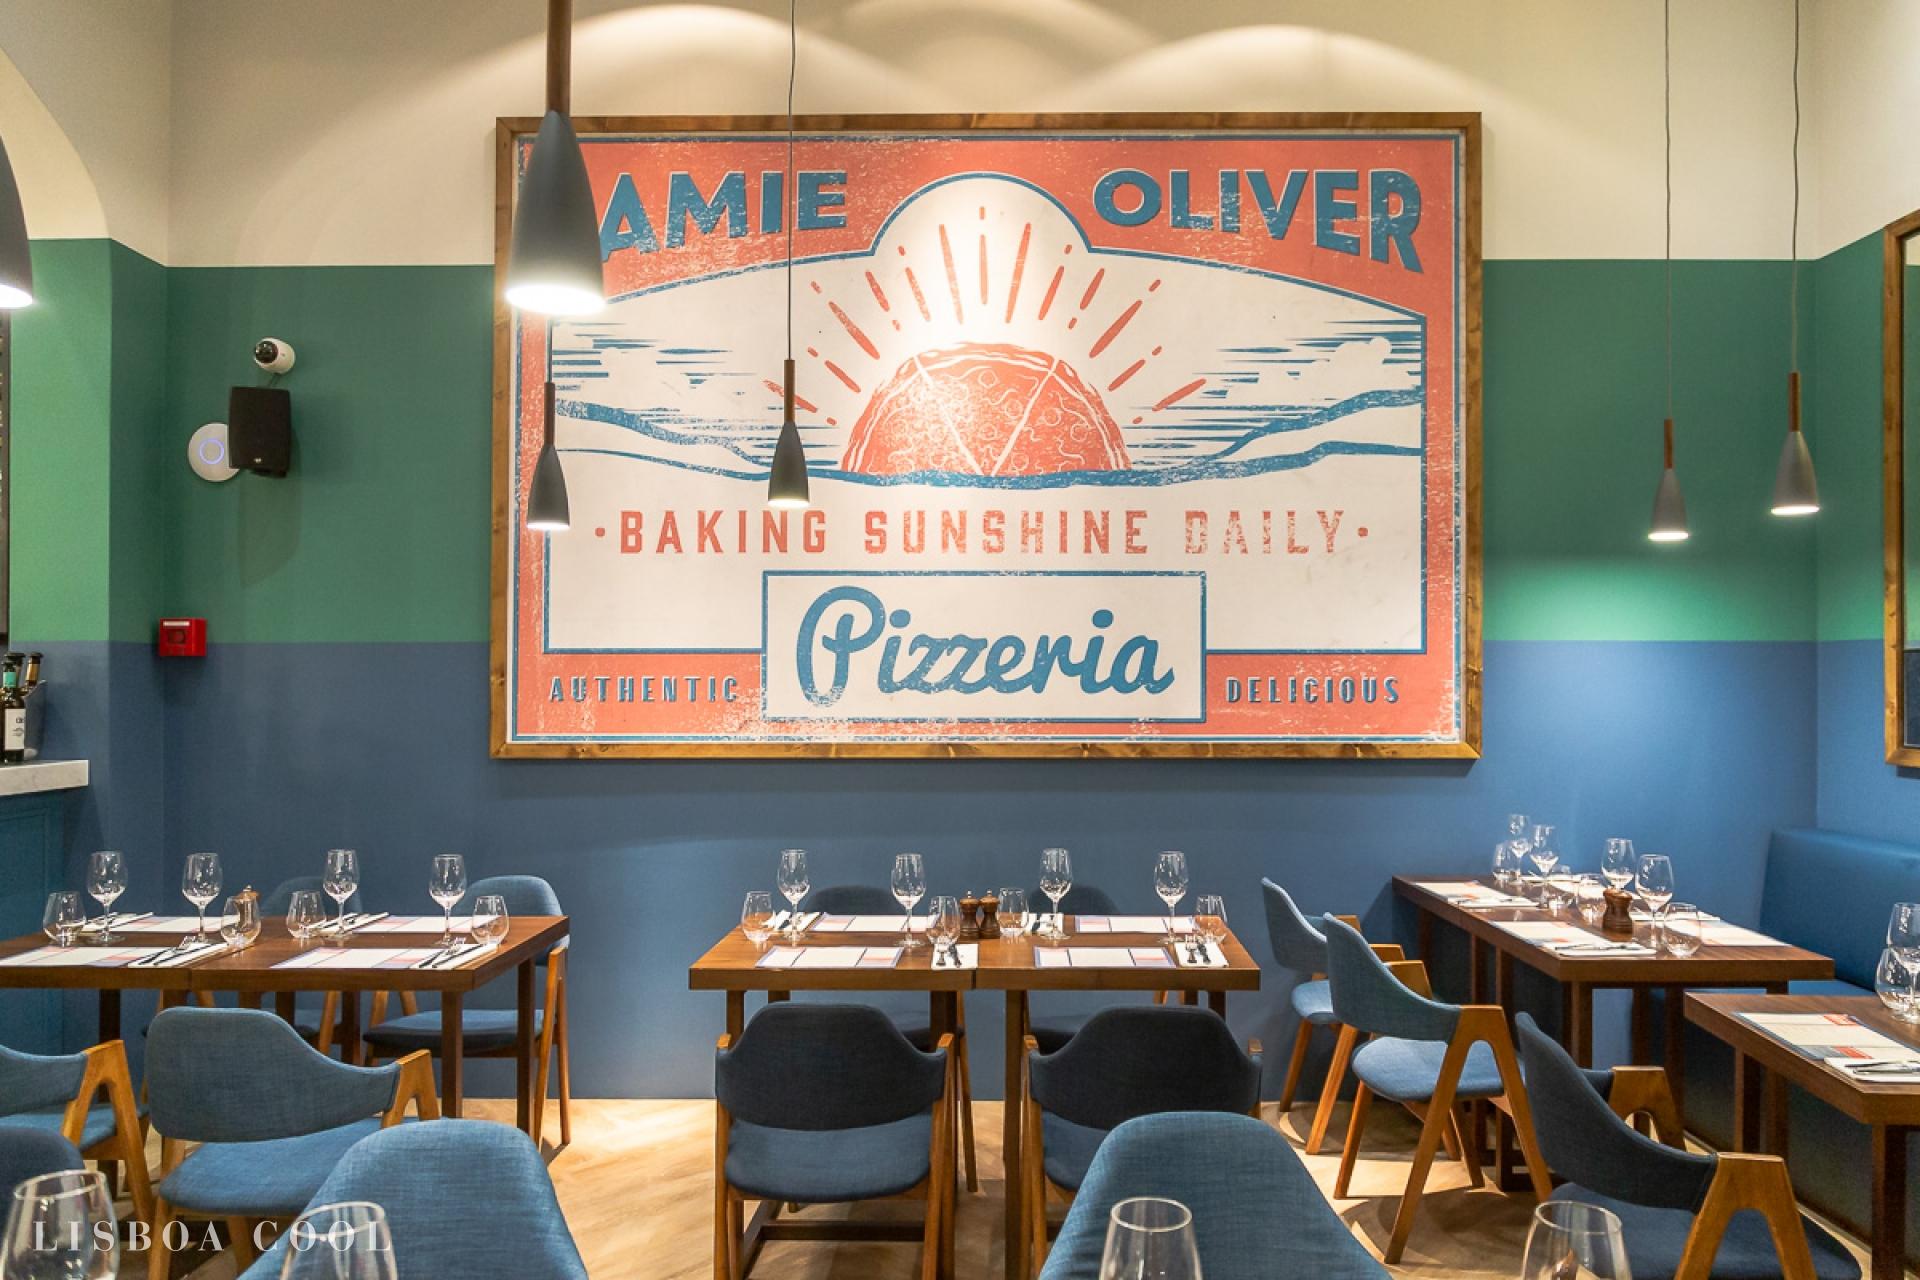 Lisboa Cool_Comer_Restaurante_Jamie Oliver Pizzeria